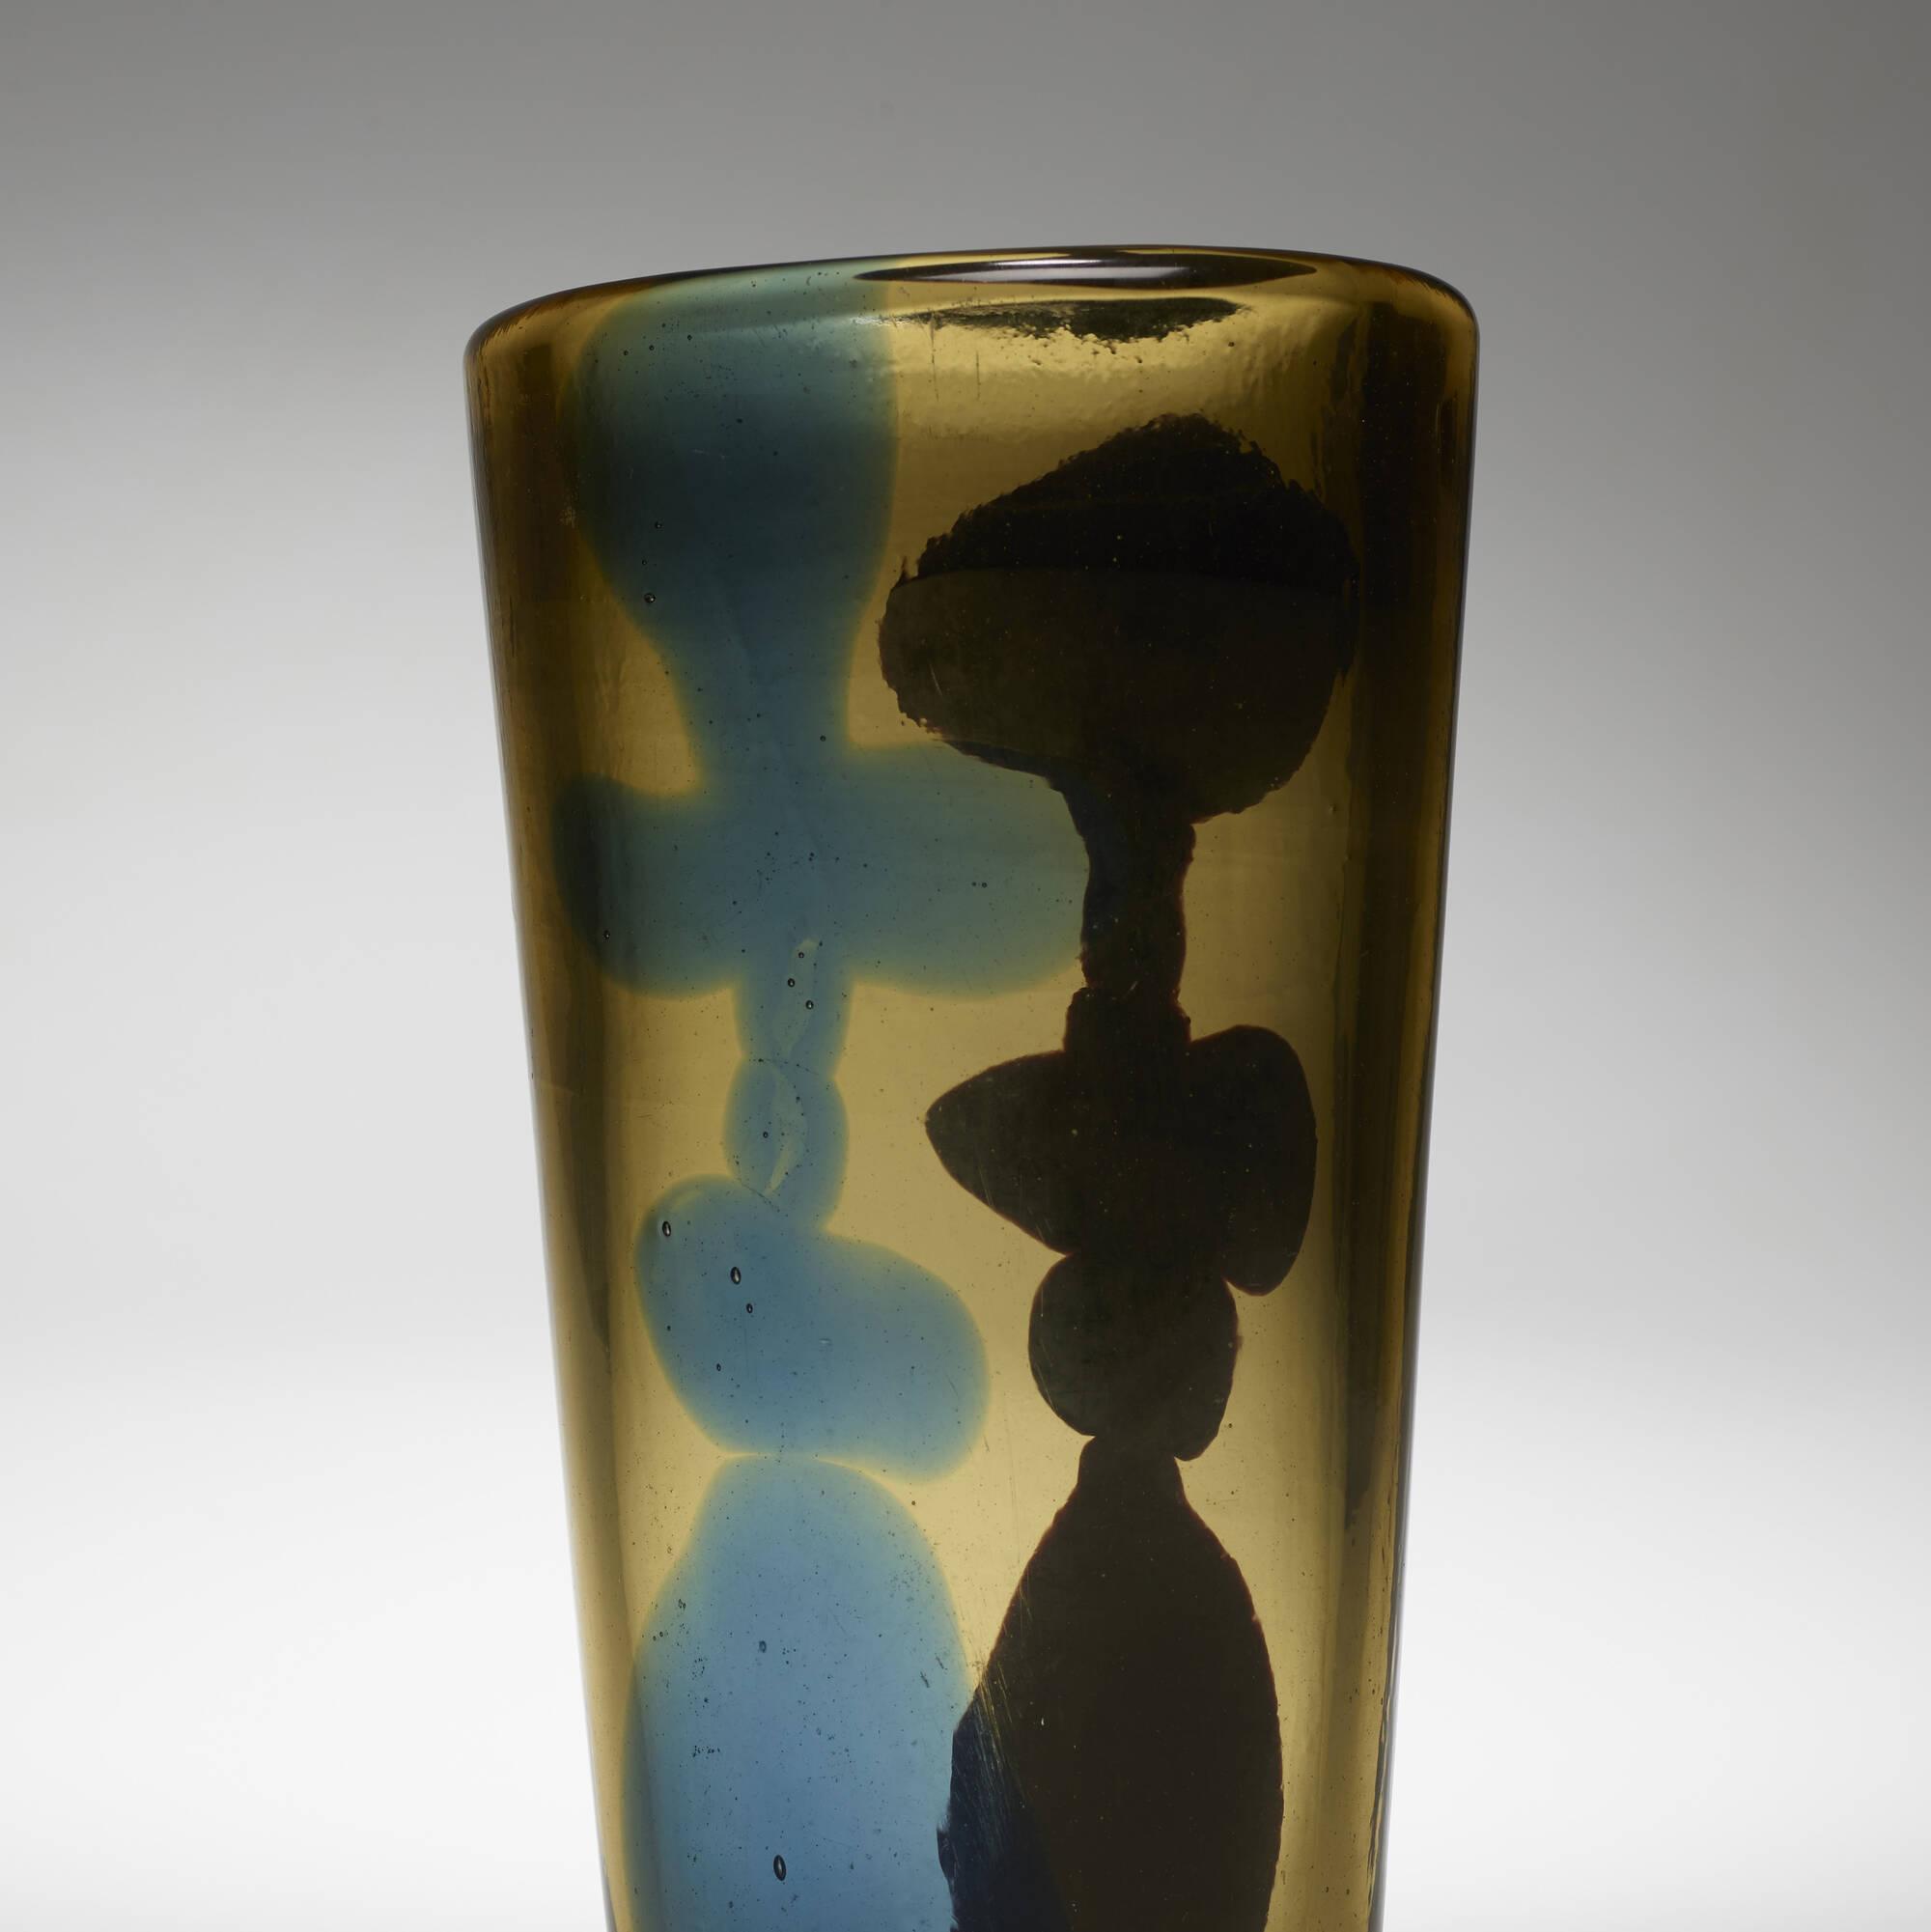 136: Fulvio Bianconi / Con Macchie vase (3 of 4)